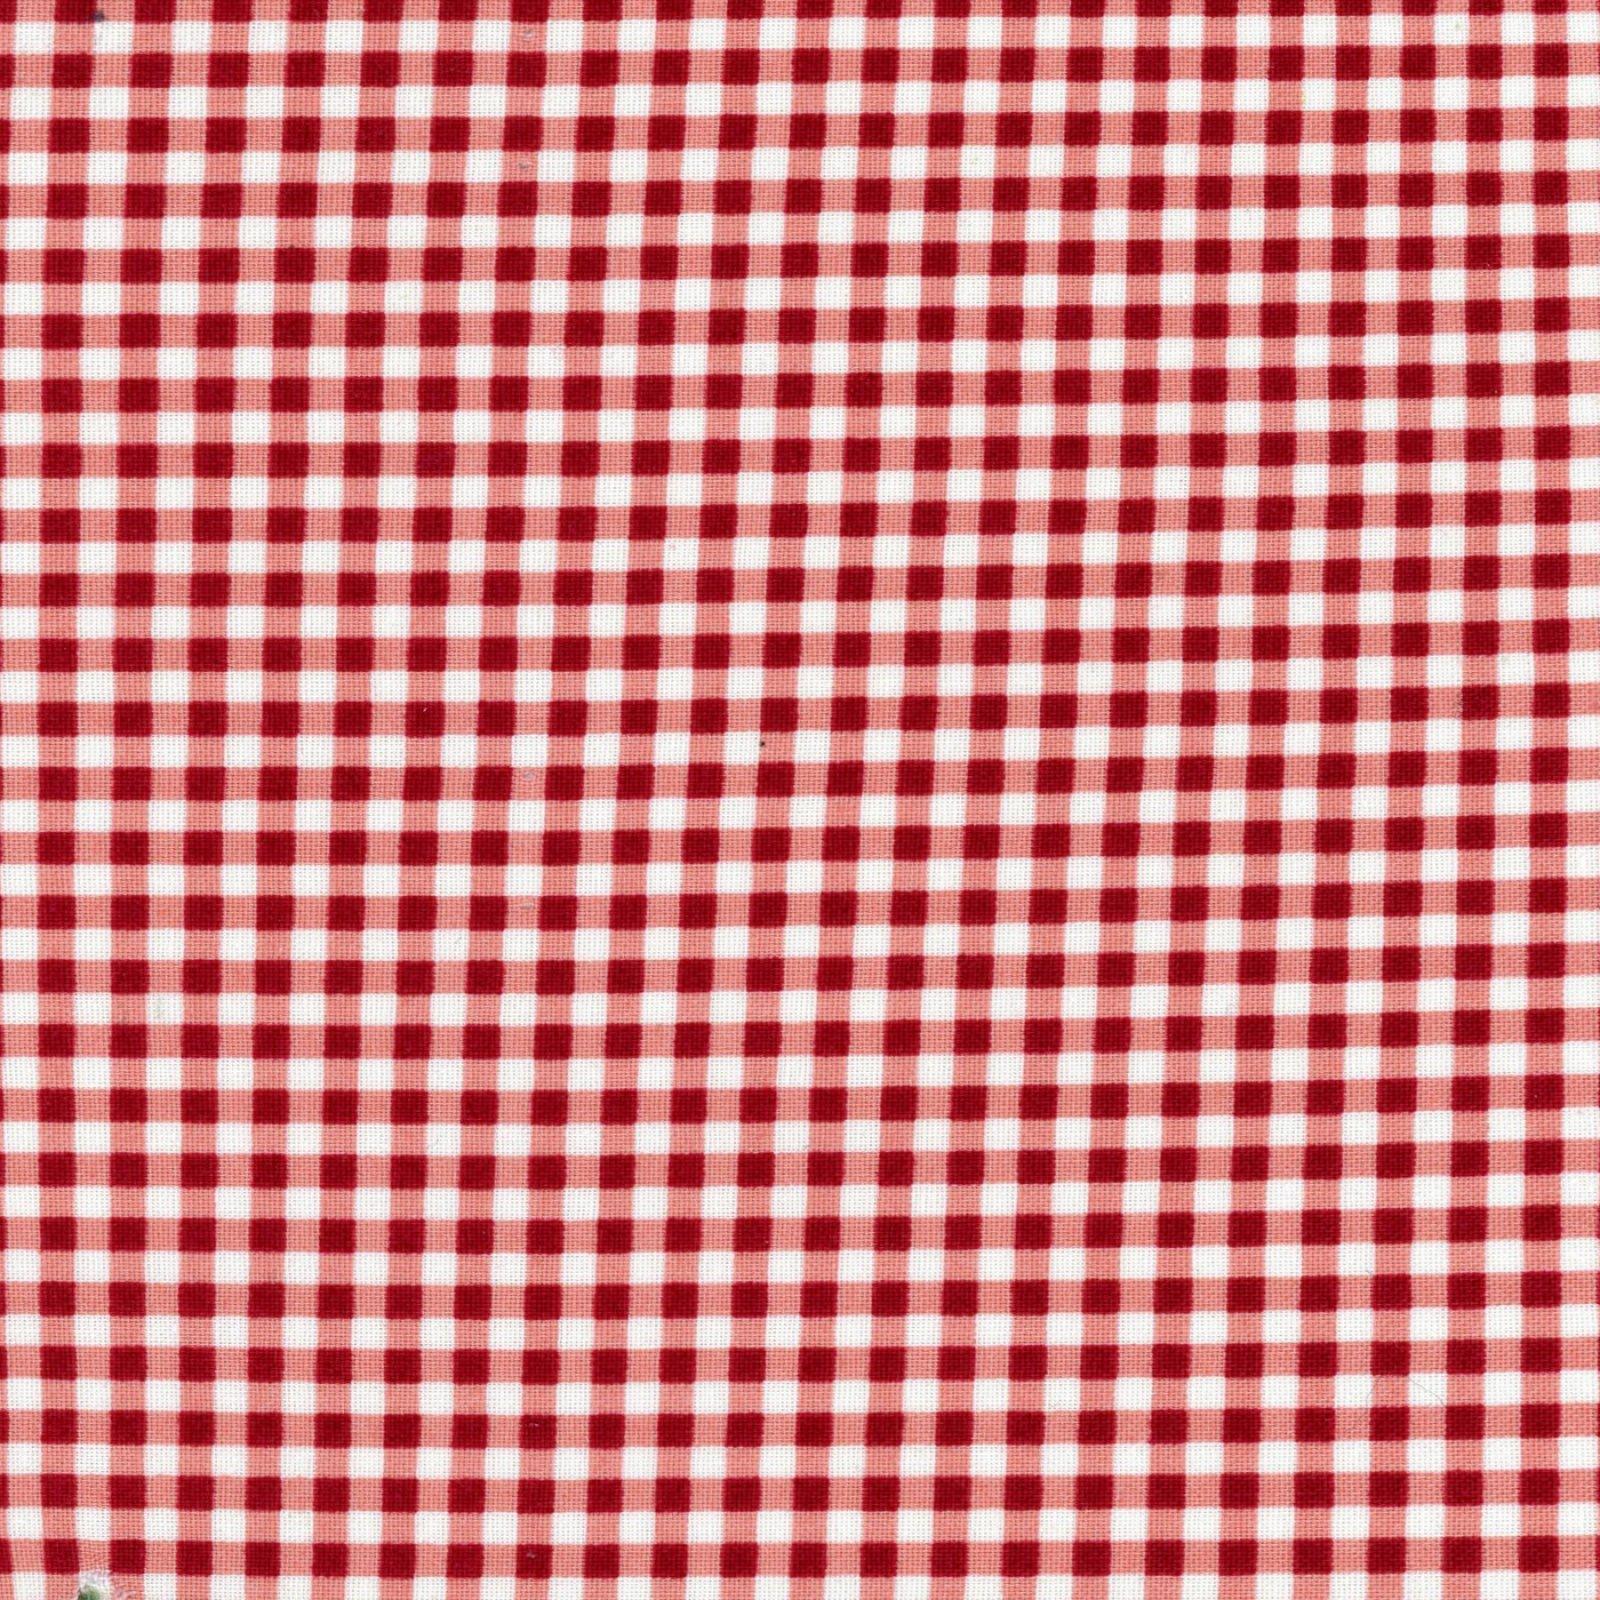 Beautiful Basics - Gingham Plaid - Red